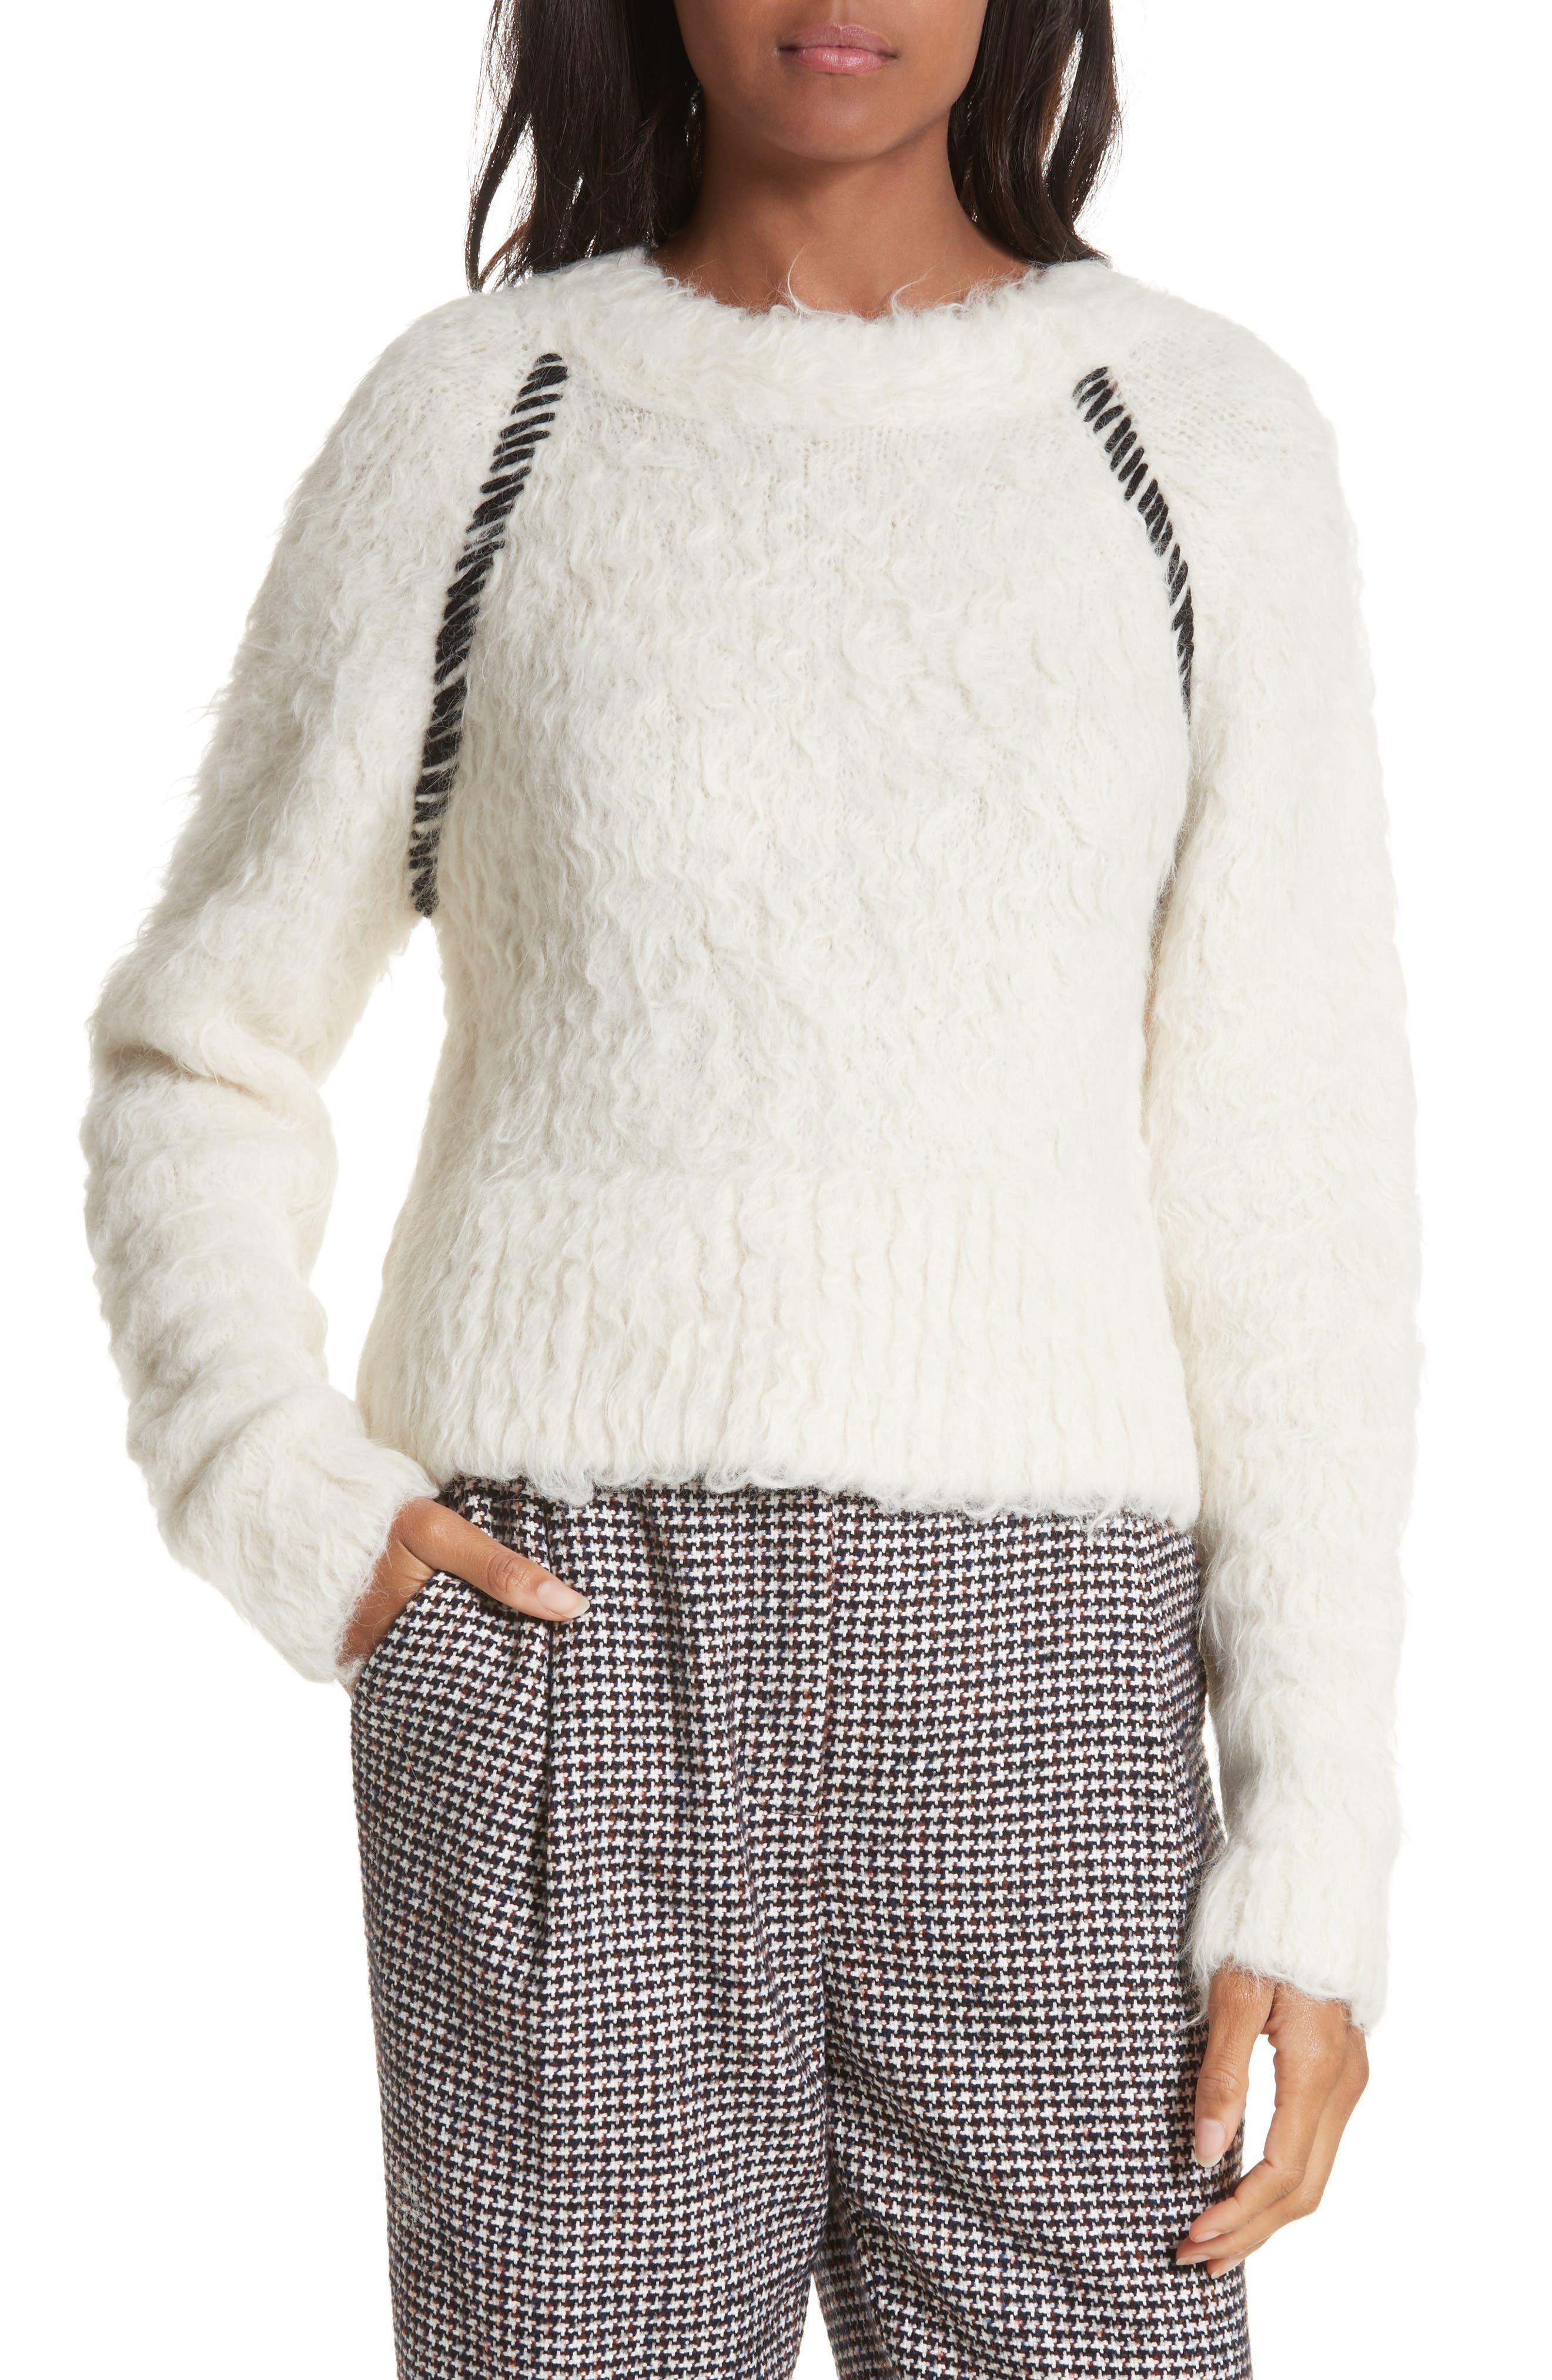 Rachel Comey Recline Alpaca & Wool Blend Sweater